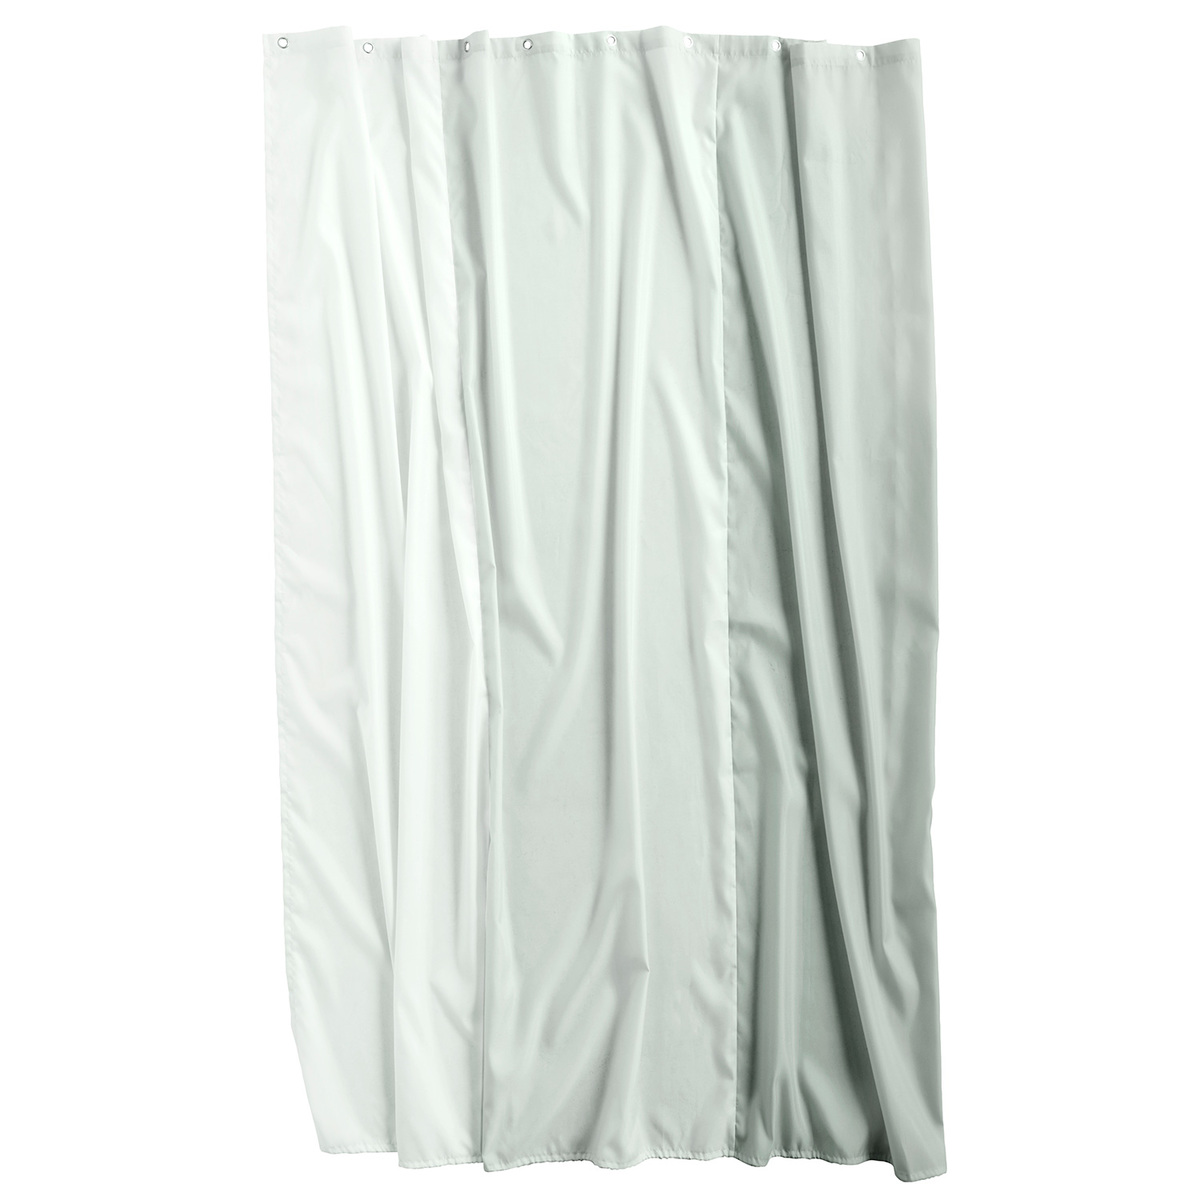 Hay Aquarelle Vertical Shower Curtain Eucalyptus Finnish Design Shop